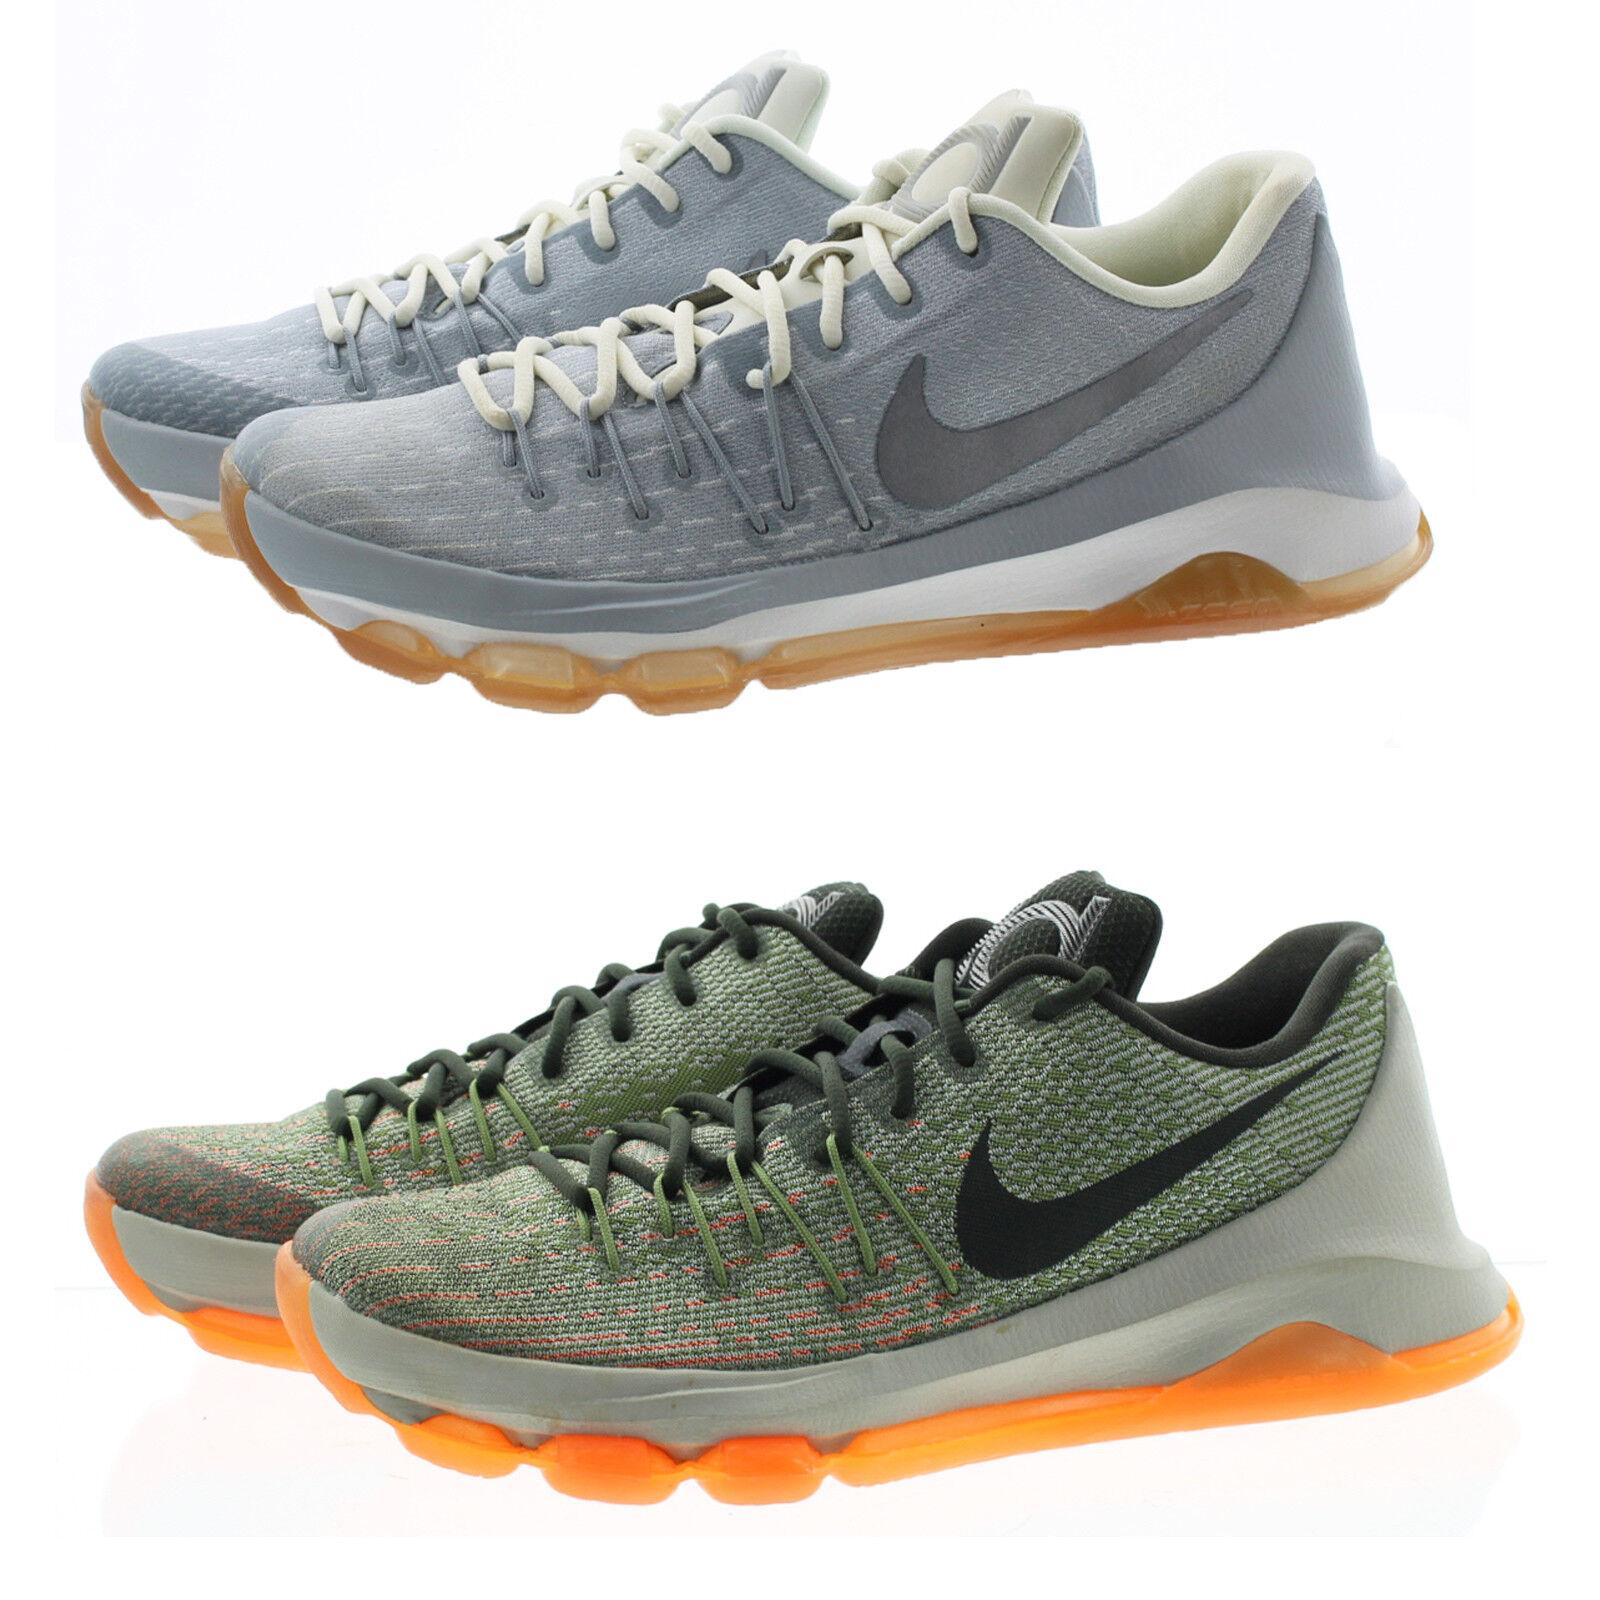 6b54b1dab62 ... Athletic Performance Basketball Shoes Sneakers a86133. Nike 749375  749375 749375 Mens KD 8